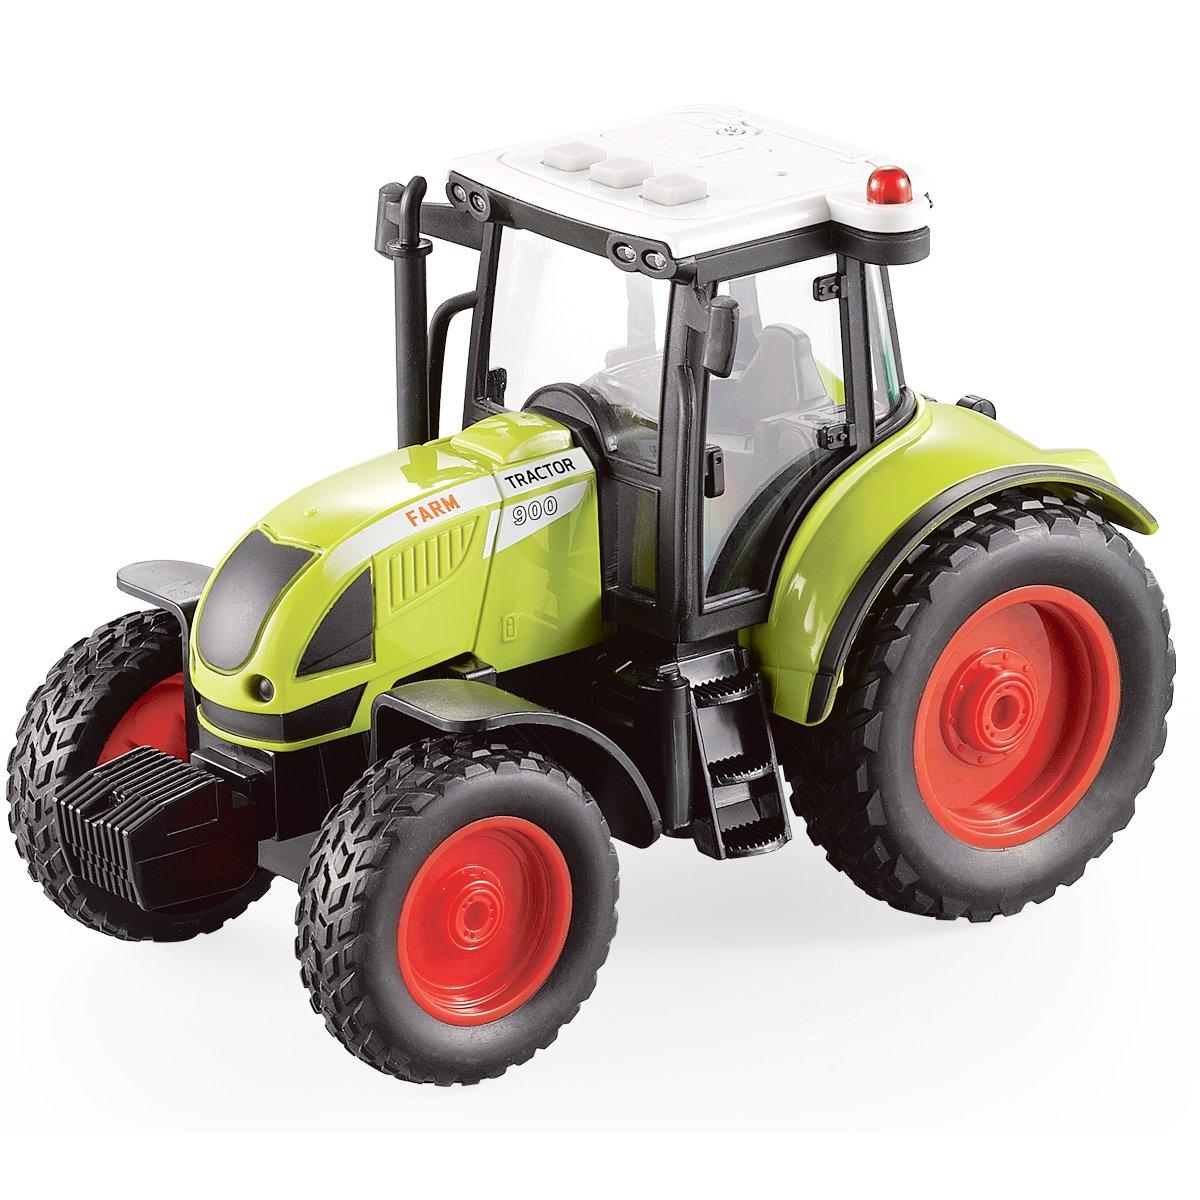 Fistone 1:16 Truck Inertia Farm Tractor Modern Farm Machinery Car Toy Simulation Farmer Tractor with Light and Music